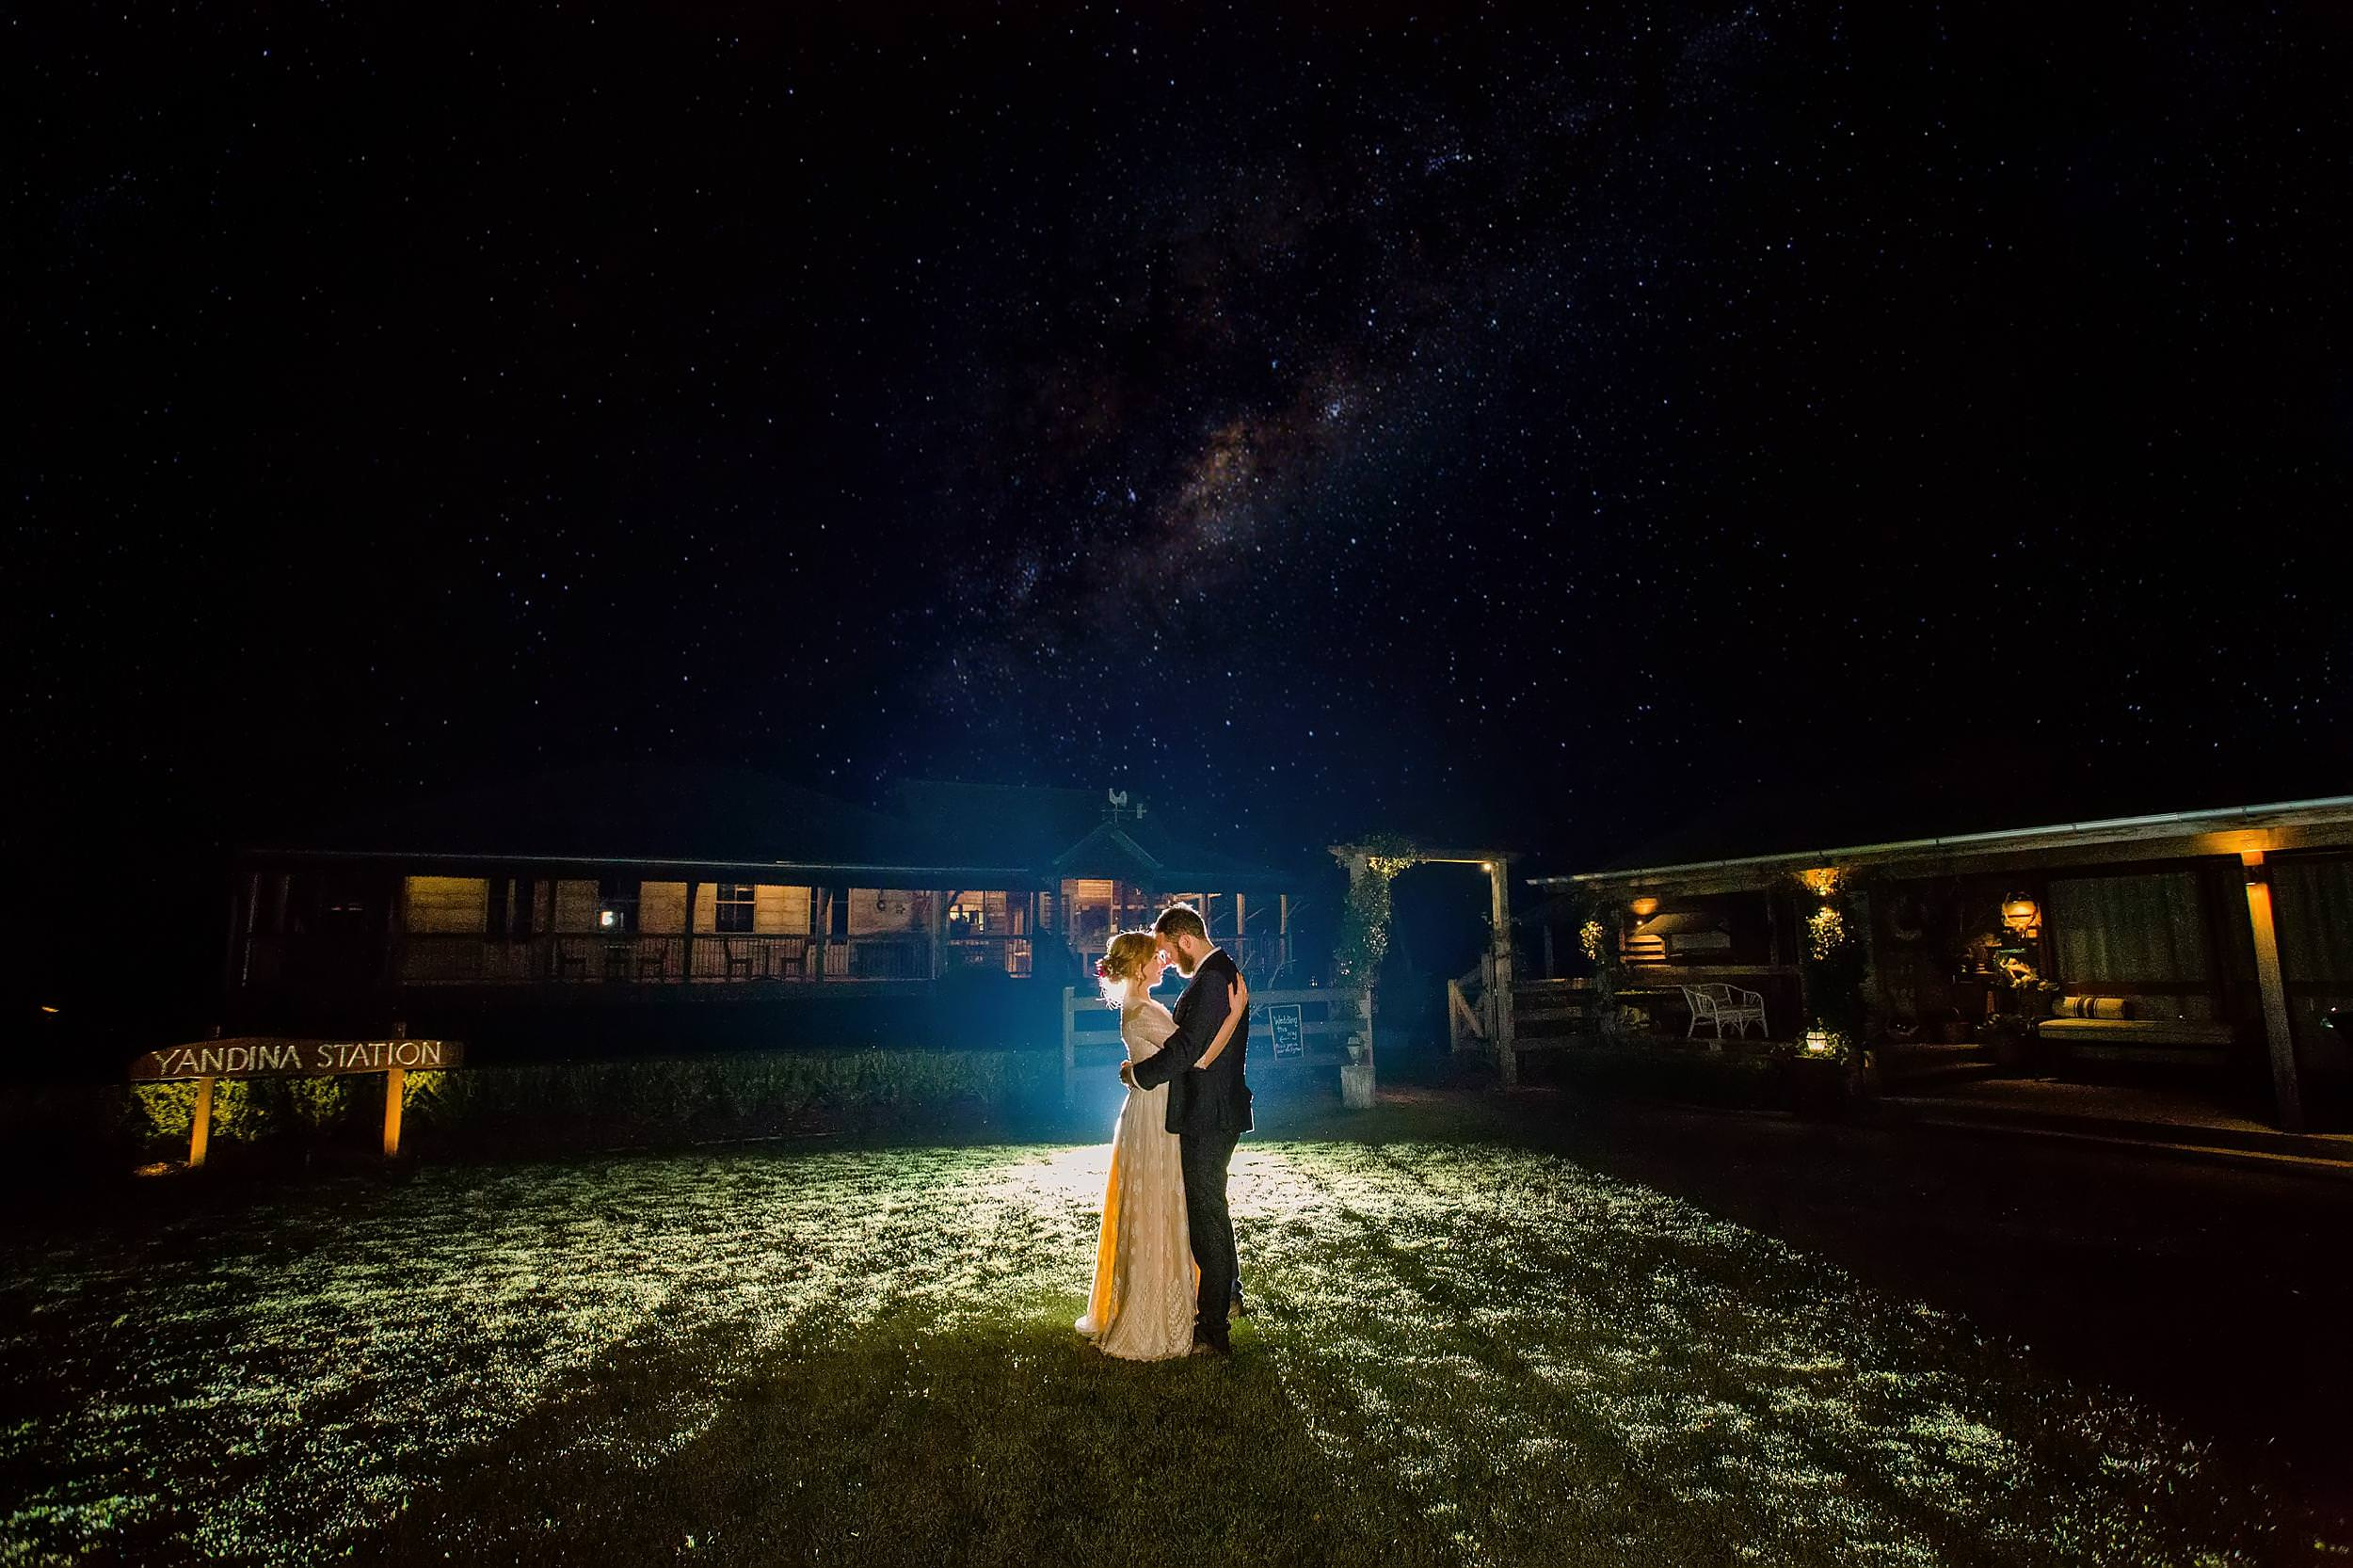 yandina-station-wedding-night-sky